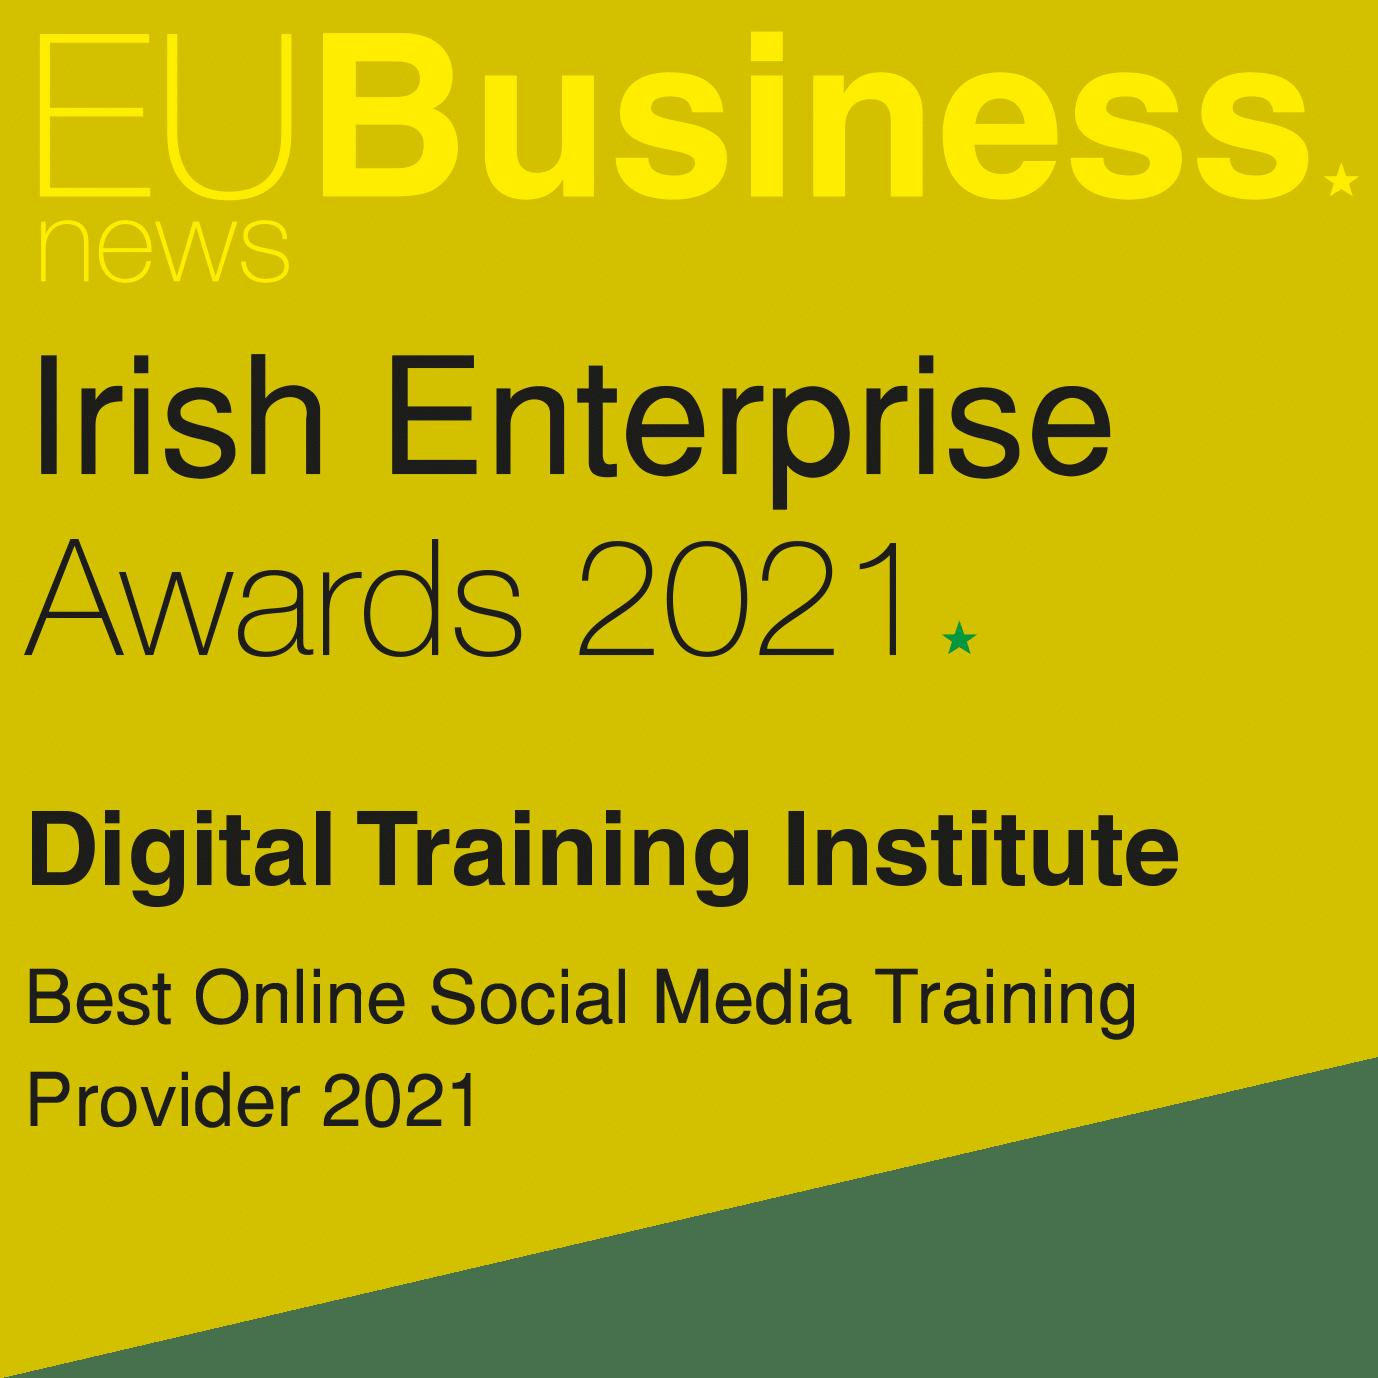 EU Business News Irish Enterprise Awards 2021